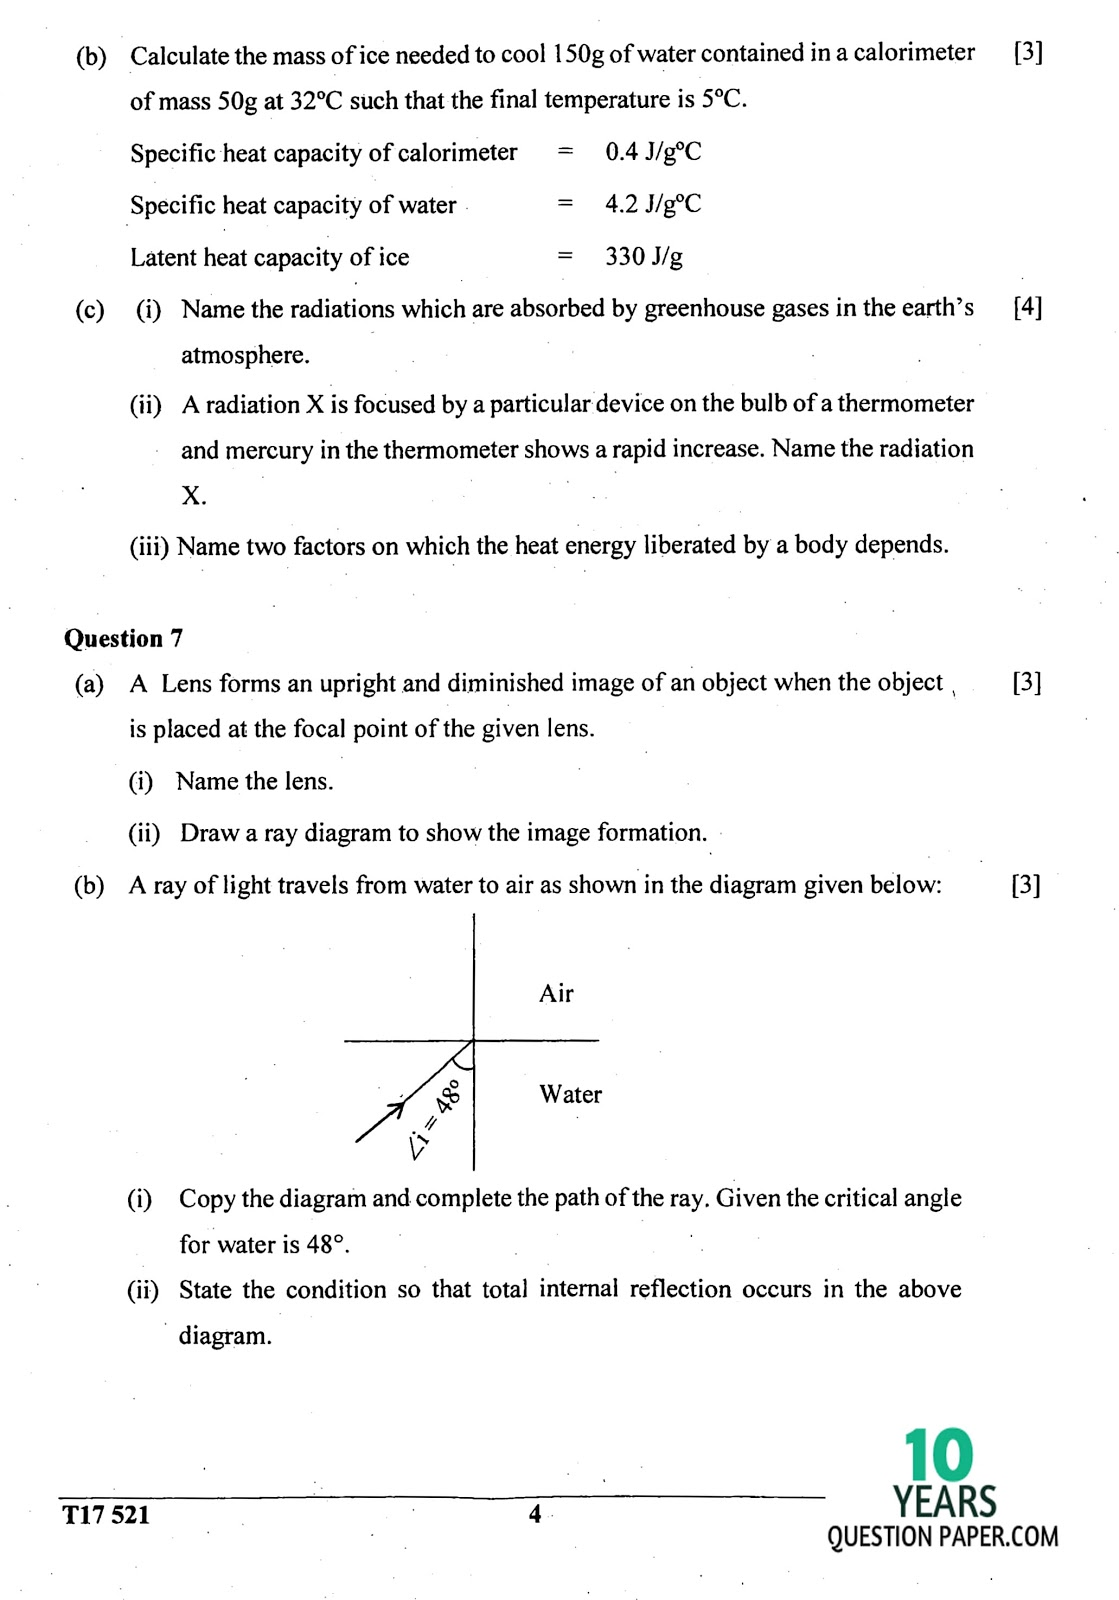 ICSE Class 10 Physics 2017 Question Paper